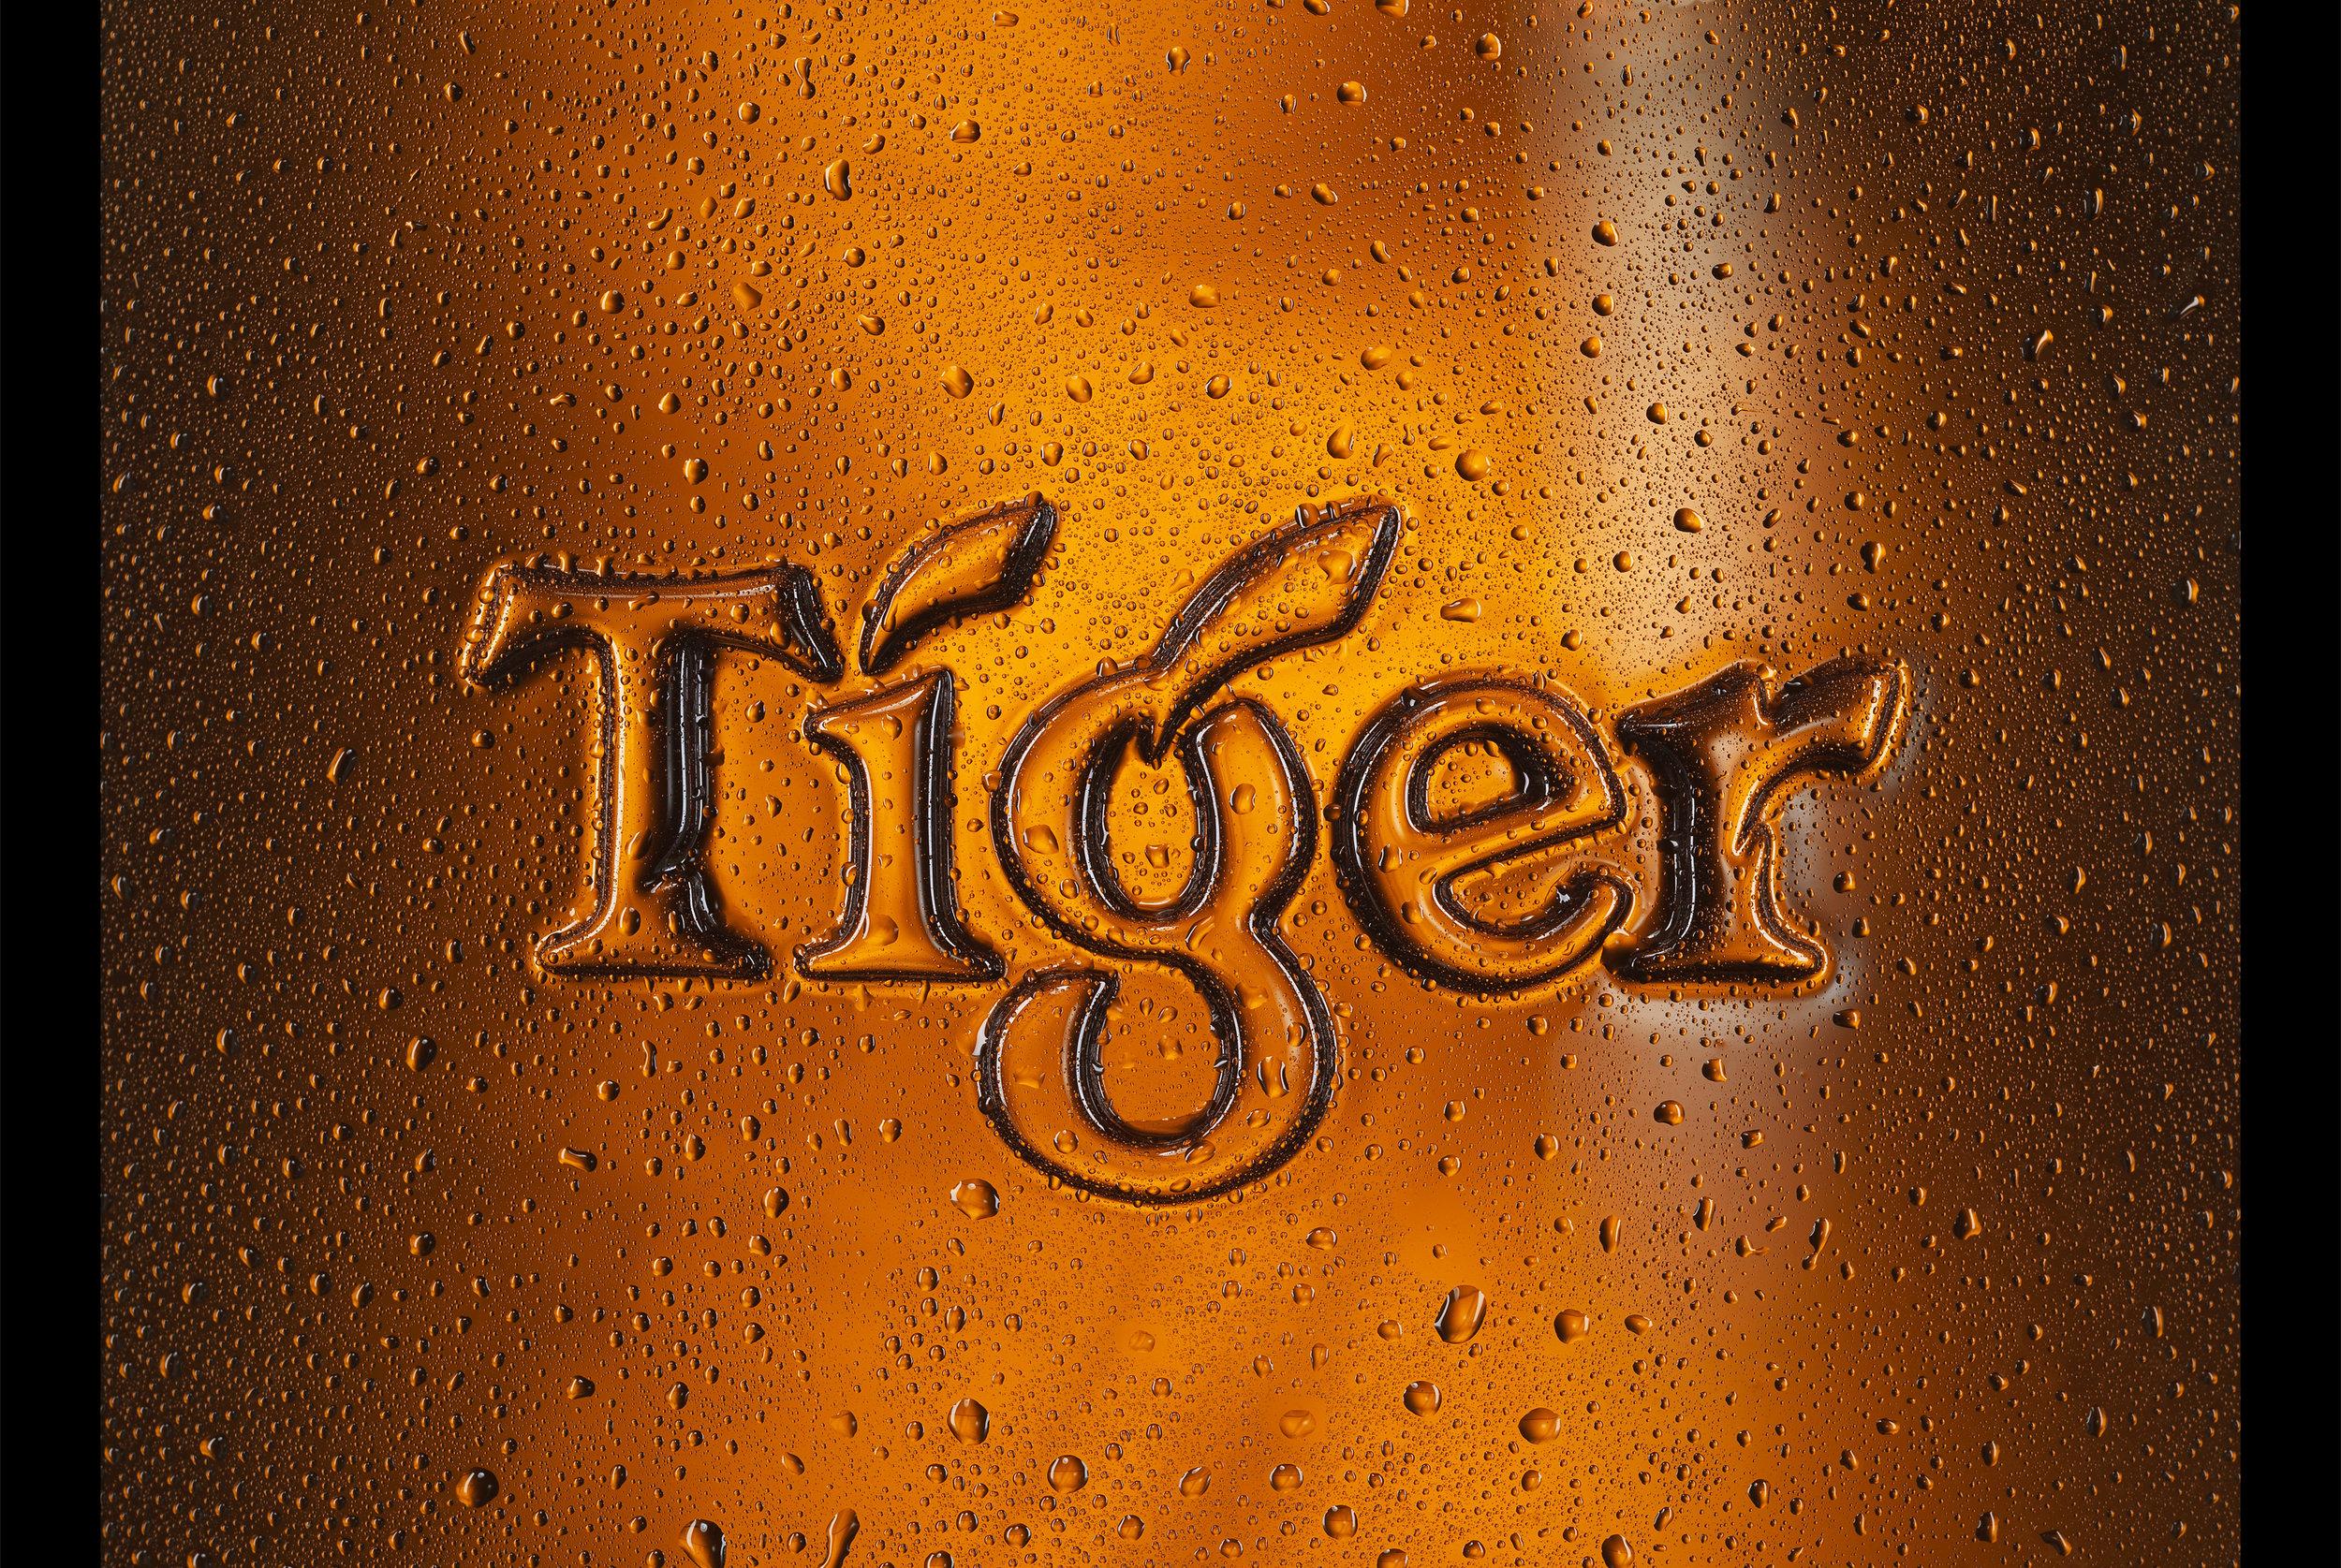 TIGER_CORE_TOP_01.jpg